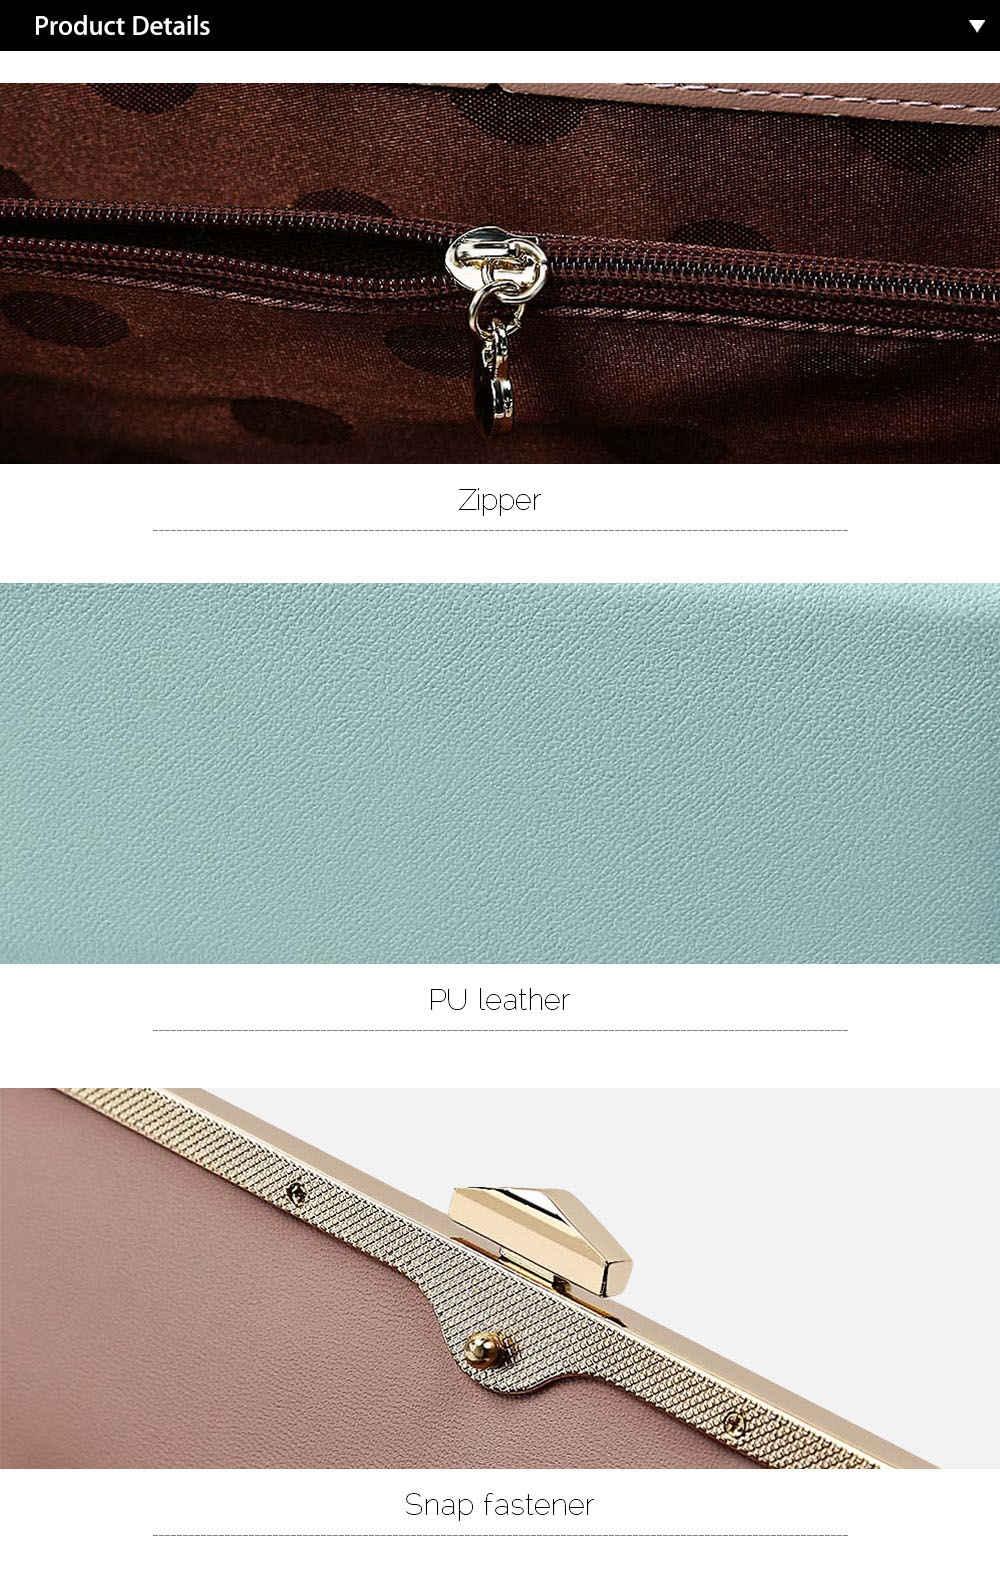 Fashionable Women Long Design Snap Fastener Card Holder Clutch Wallet